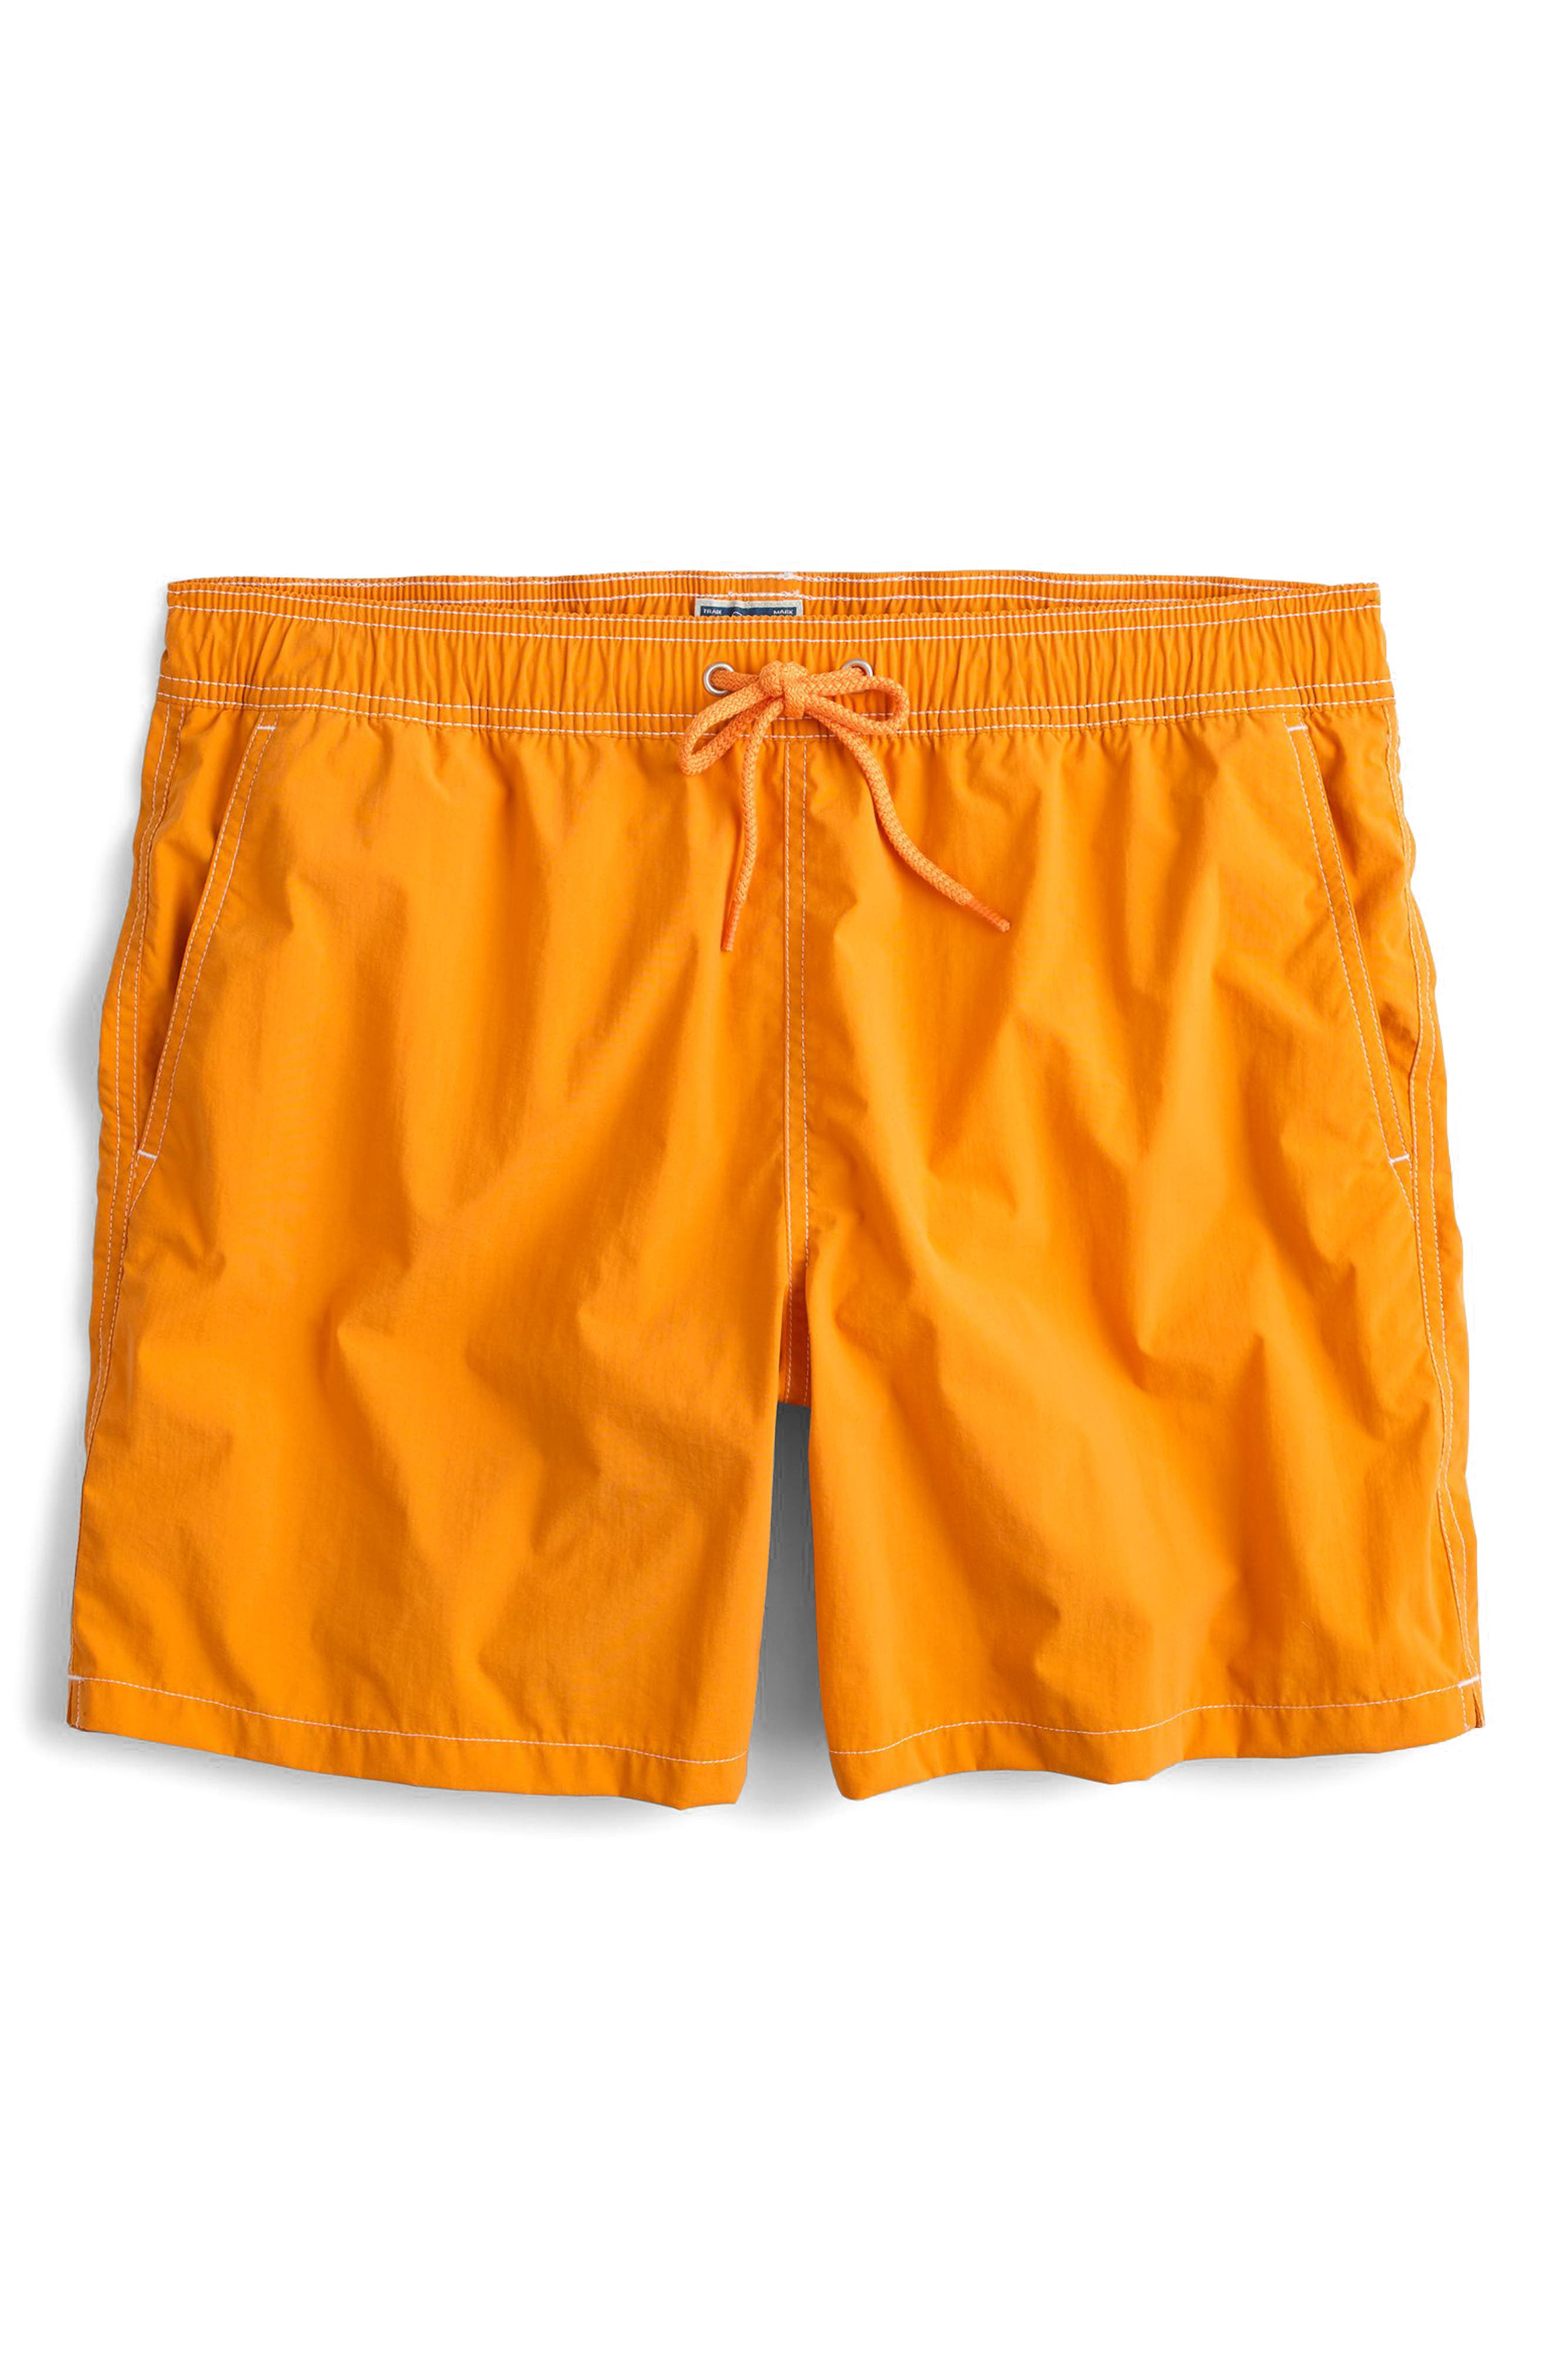 J.Crew Solid Swim Trunks,                         Main,                         color, Golden Sunset